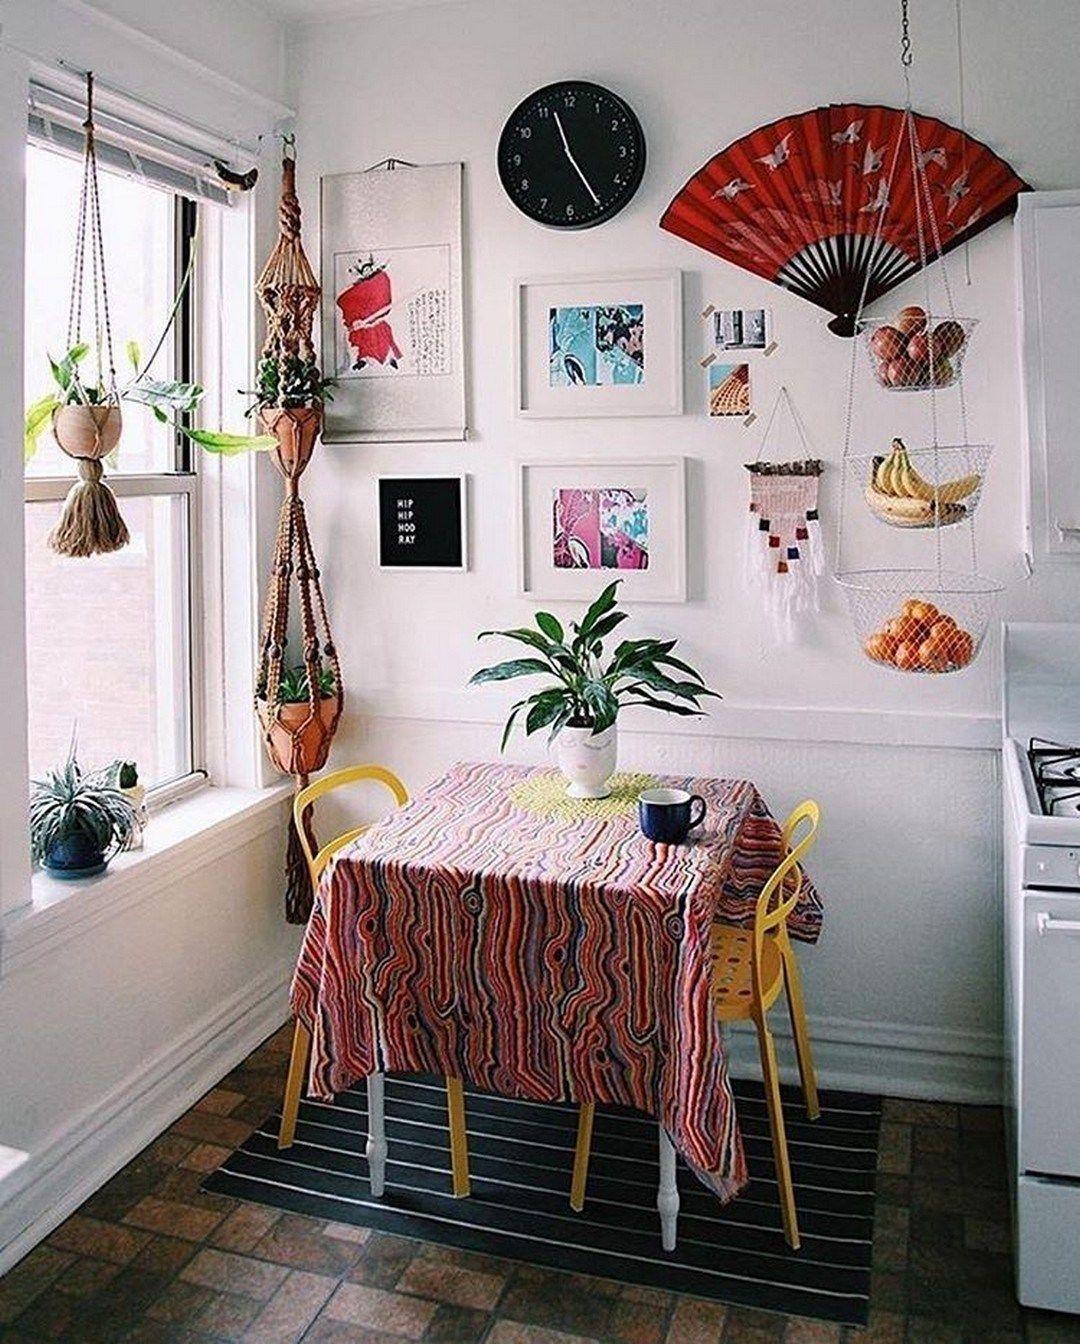 29 design ideas for boho style kitchens 8 funky home decor apartment decor home decor on boho chic kitchen diy id=92254